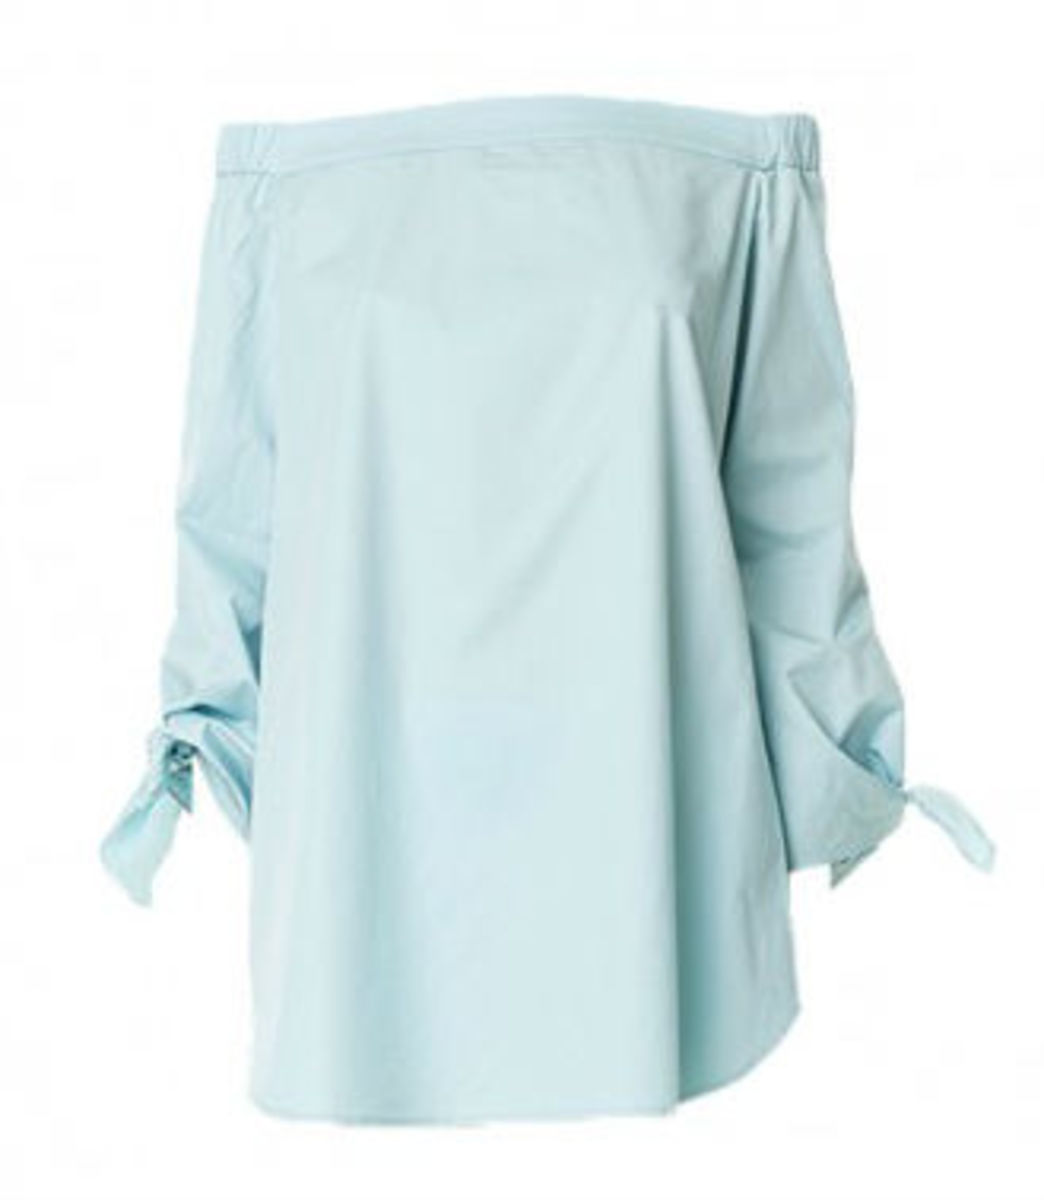 tibi-satin-poplin-off-the-shoulder-blouse-mizu-blue-ts215spp73658.jpg